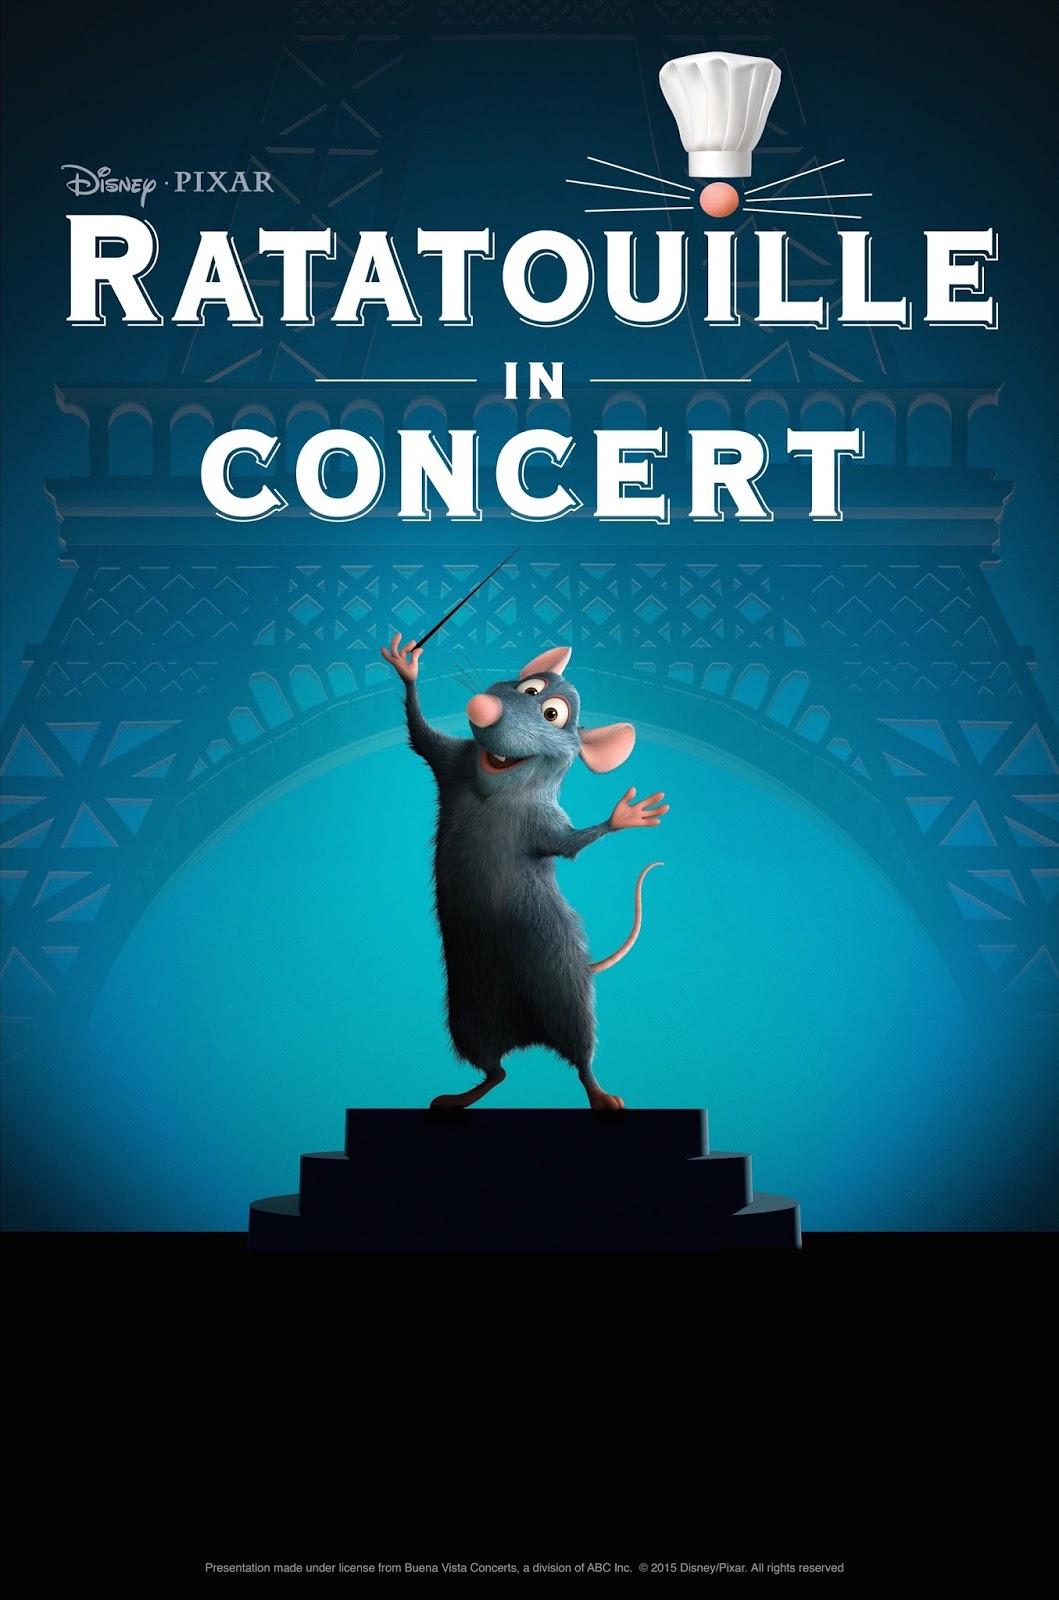 [Pixar%2BPost%2B-%2Bratatouille-in-concert-poster-no-type--3%2BRezise]